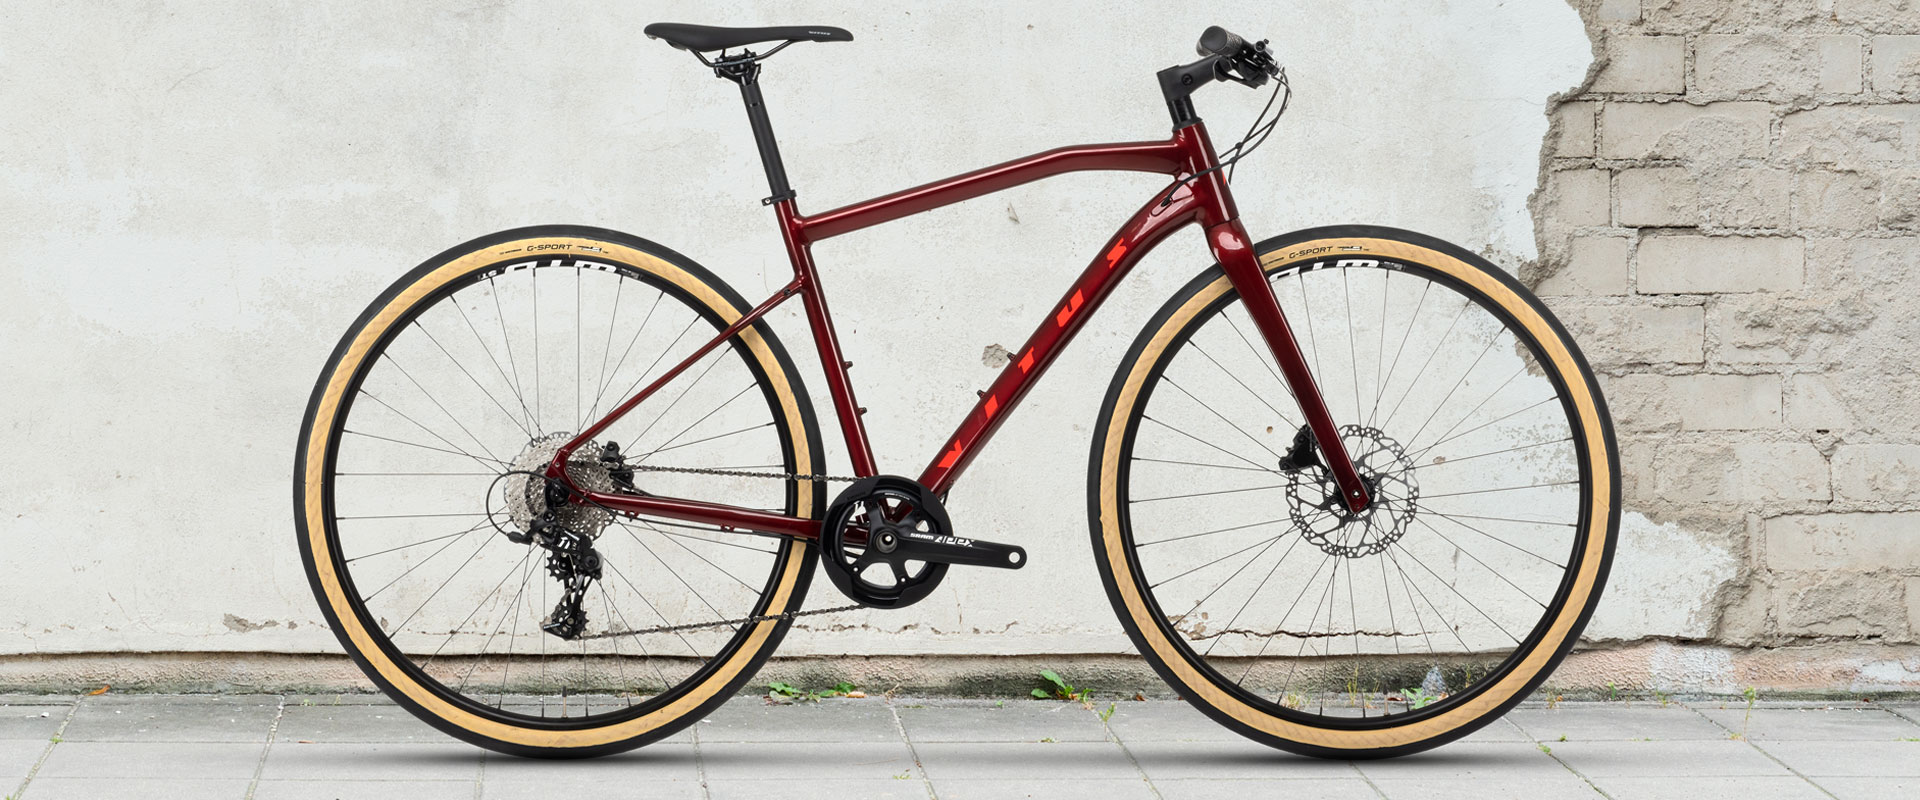 Vitus Mach 3 VRX Urban Bike Apex